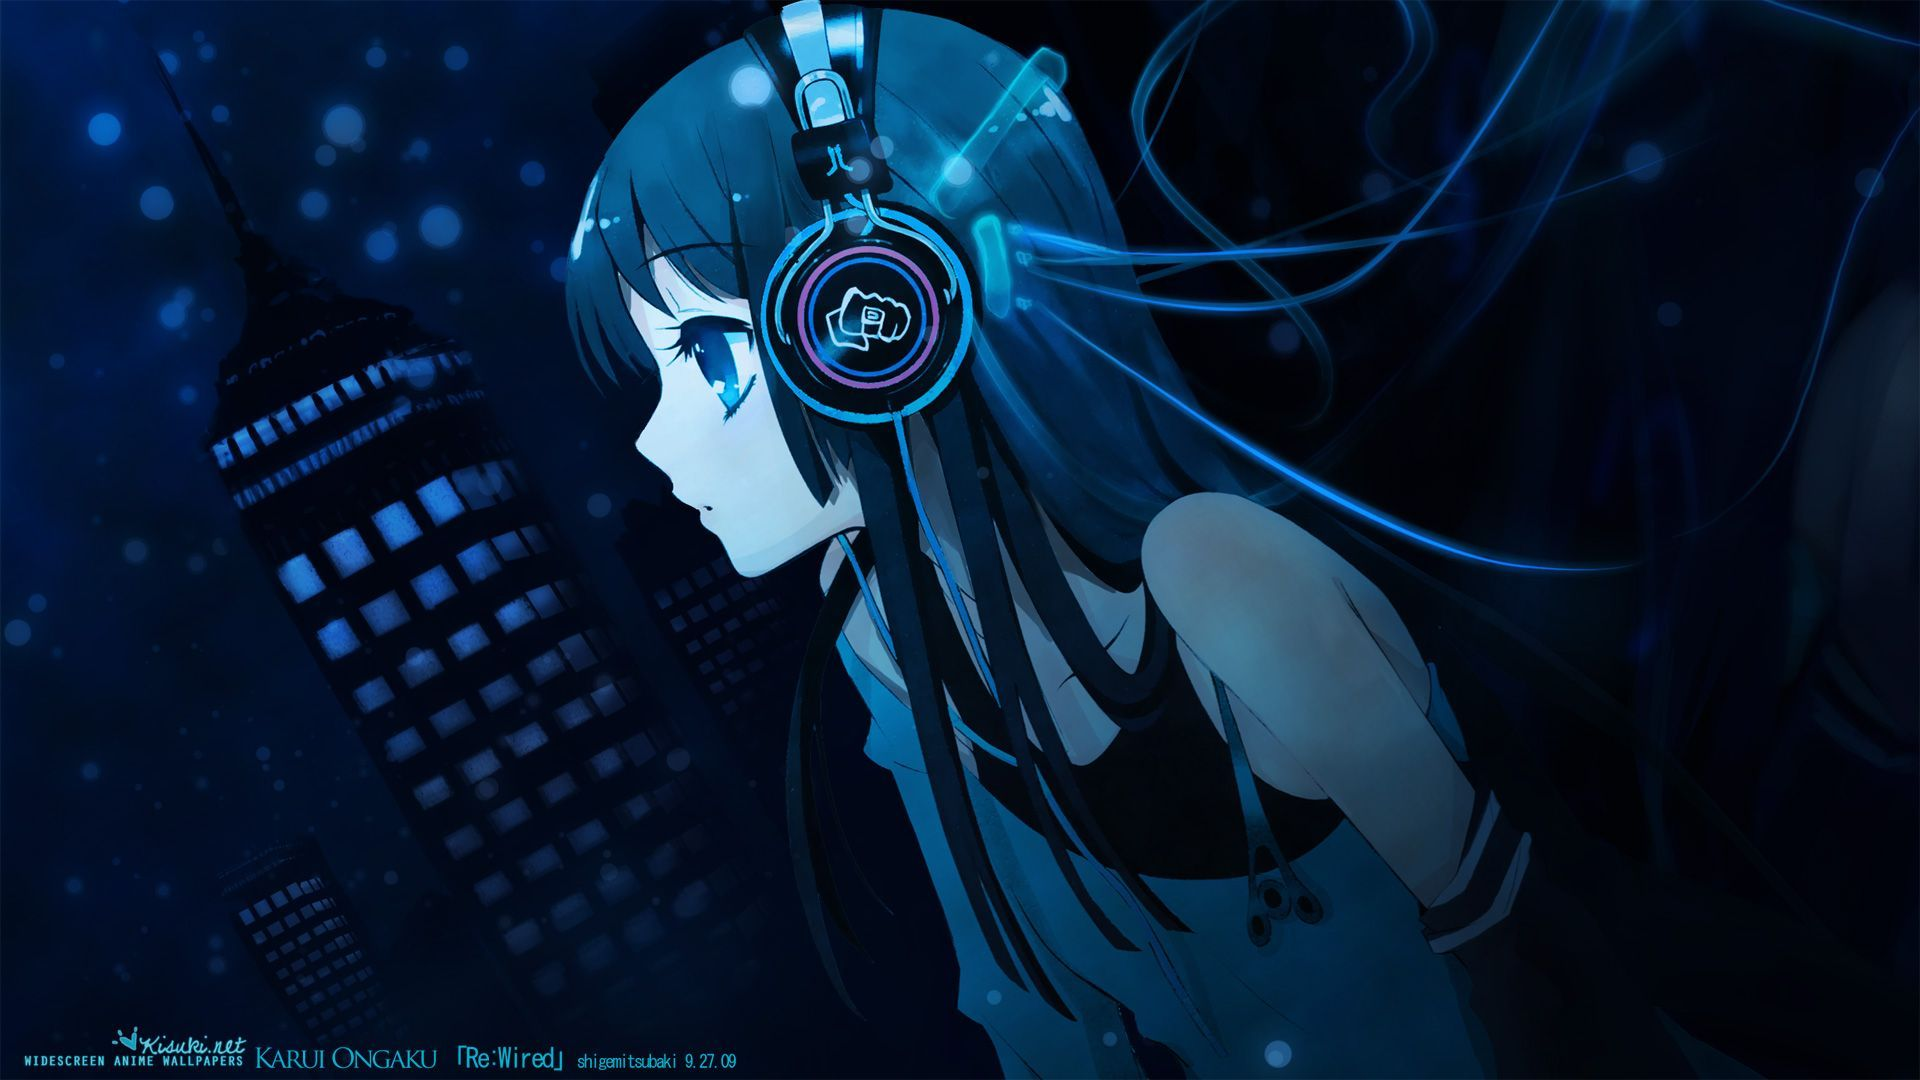 Pin On Music Wallpaper Emo anime wallpaper for laptop